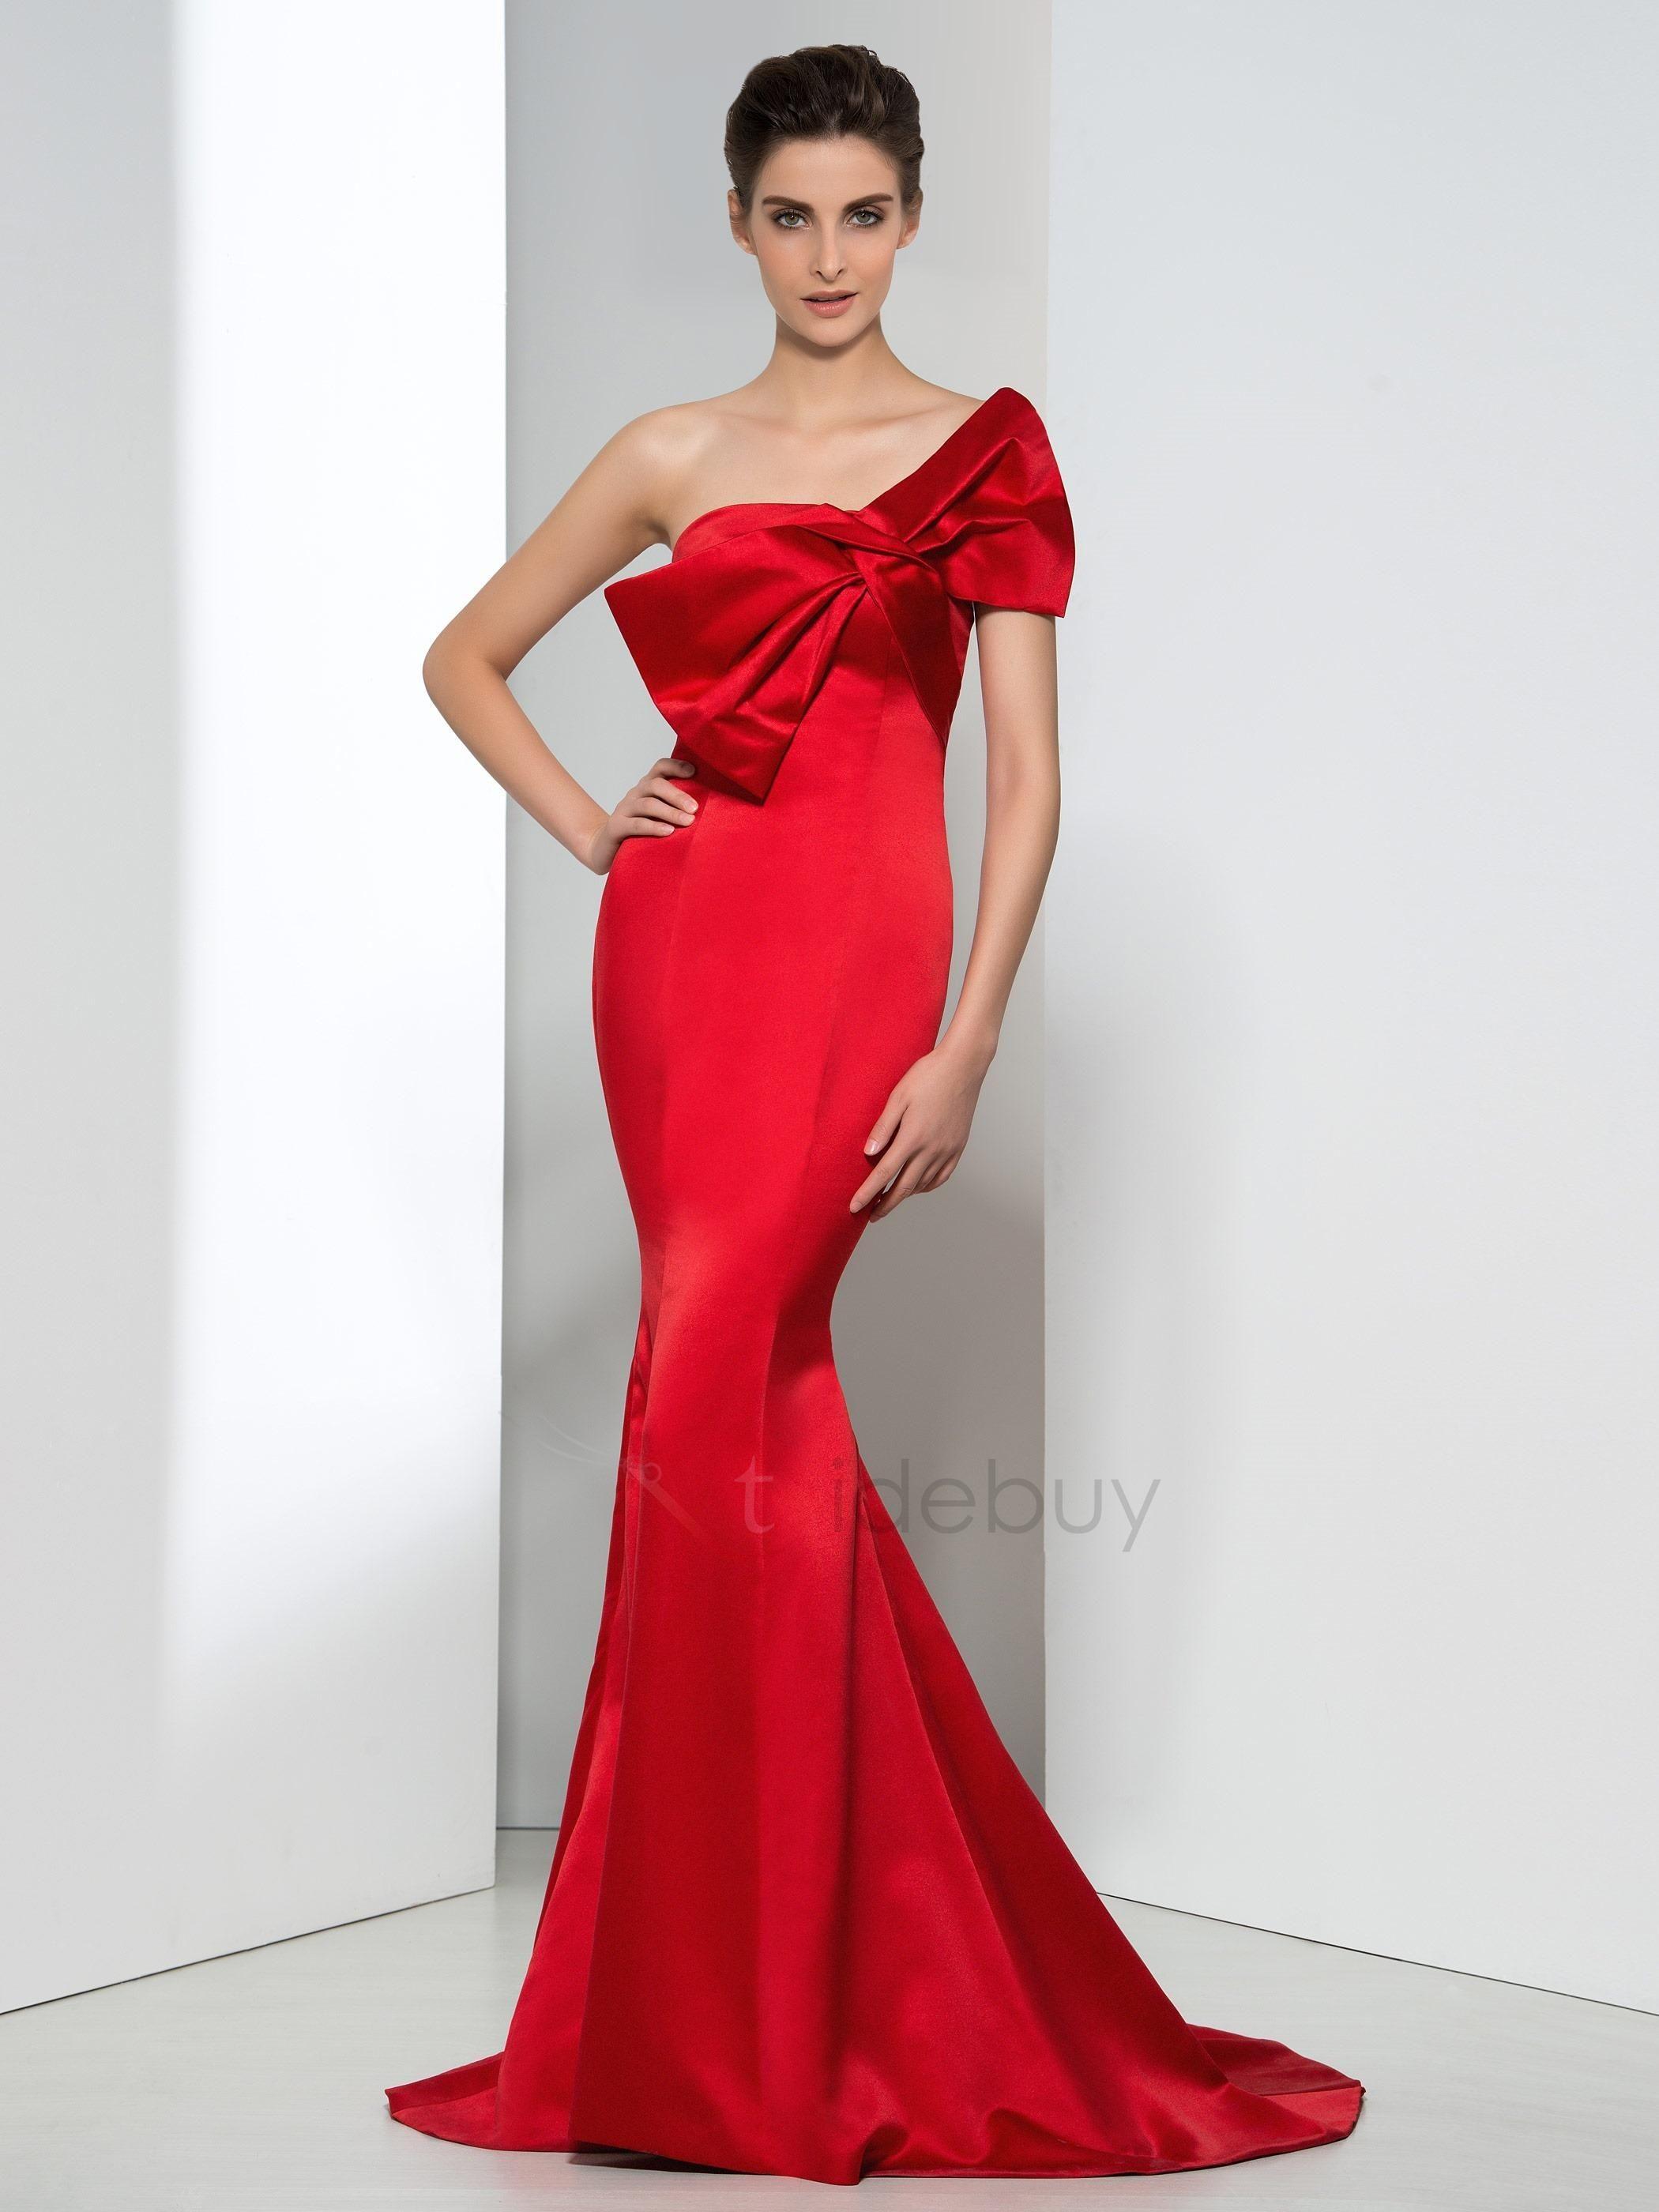 Timeless strapless bowknot mermaid red evening dress mermaid